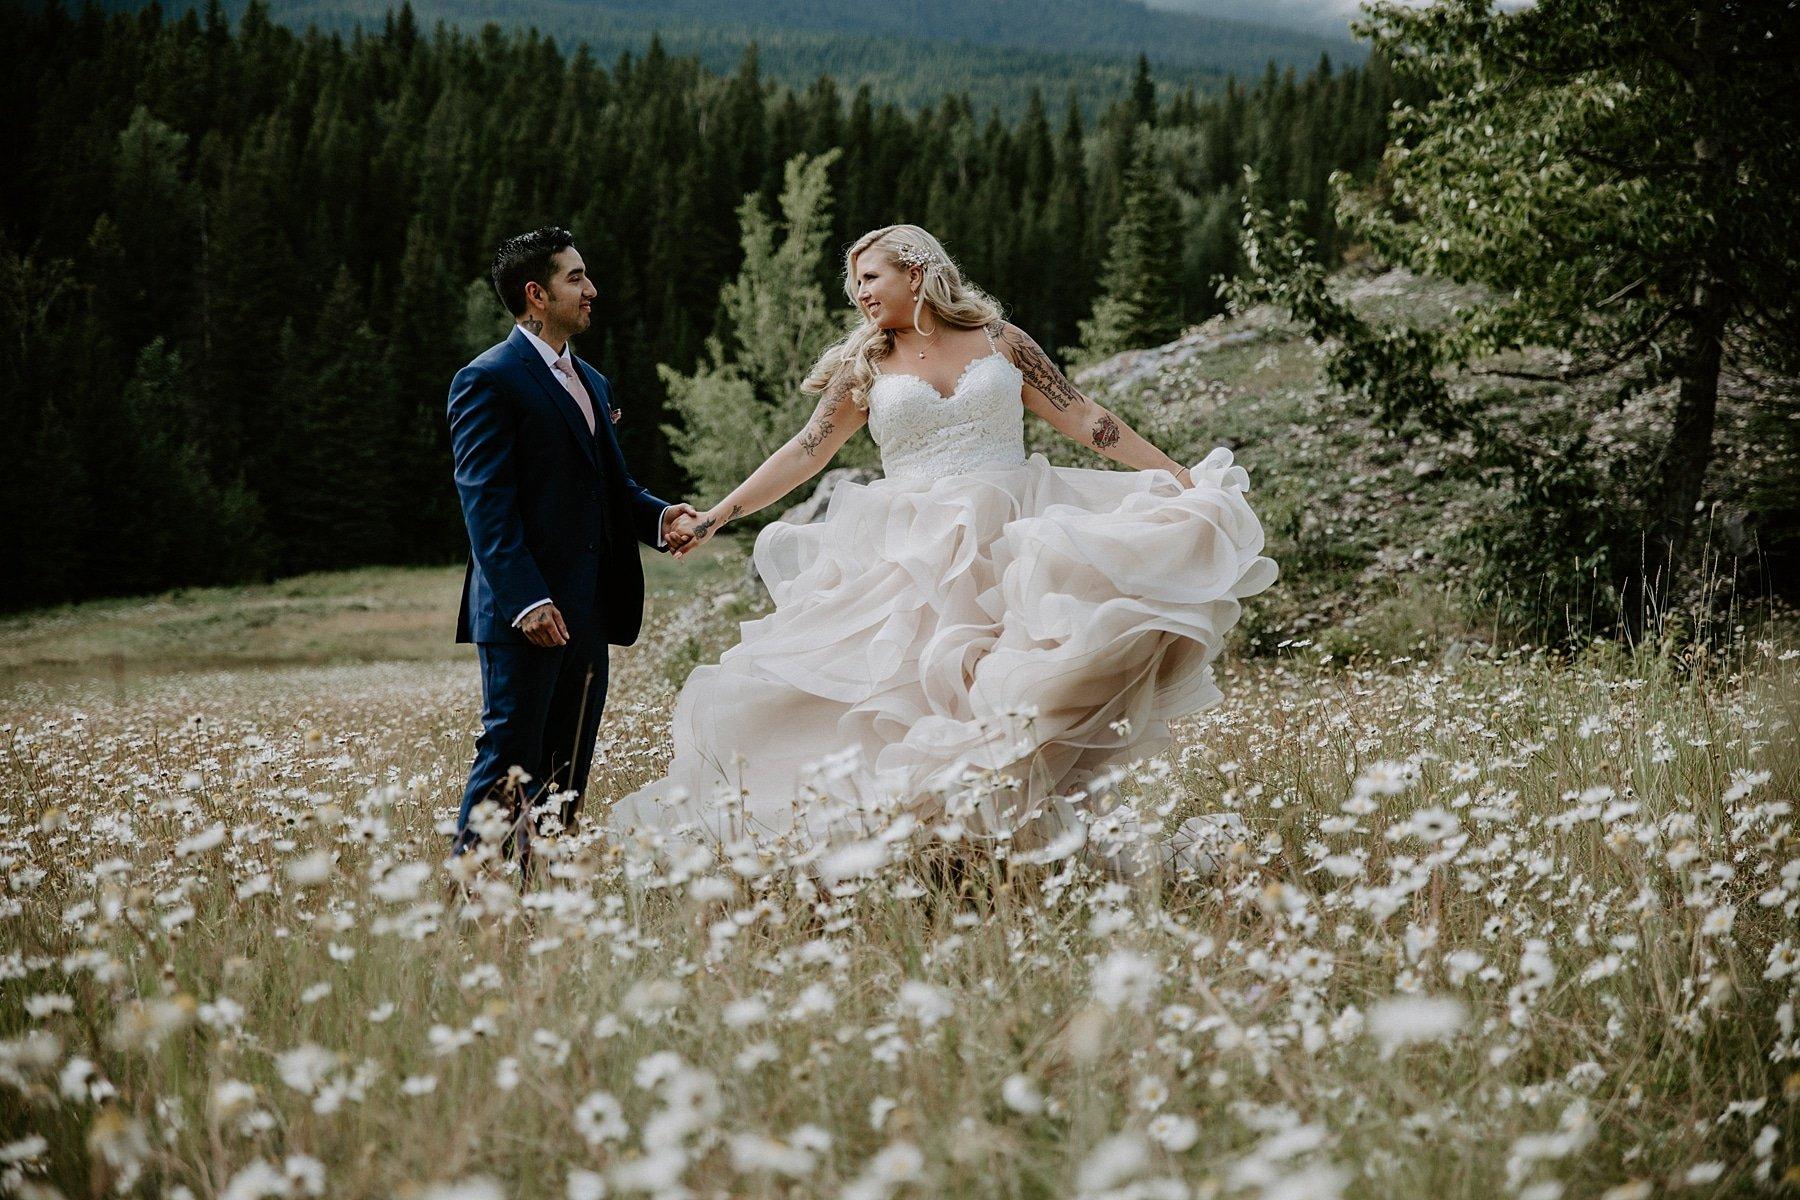 Banff Wedding Photos in wildflowers